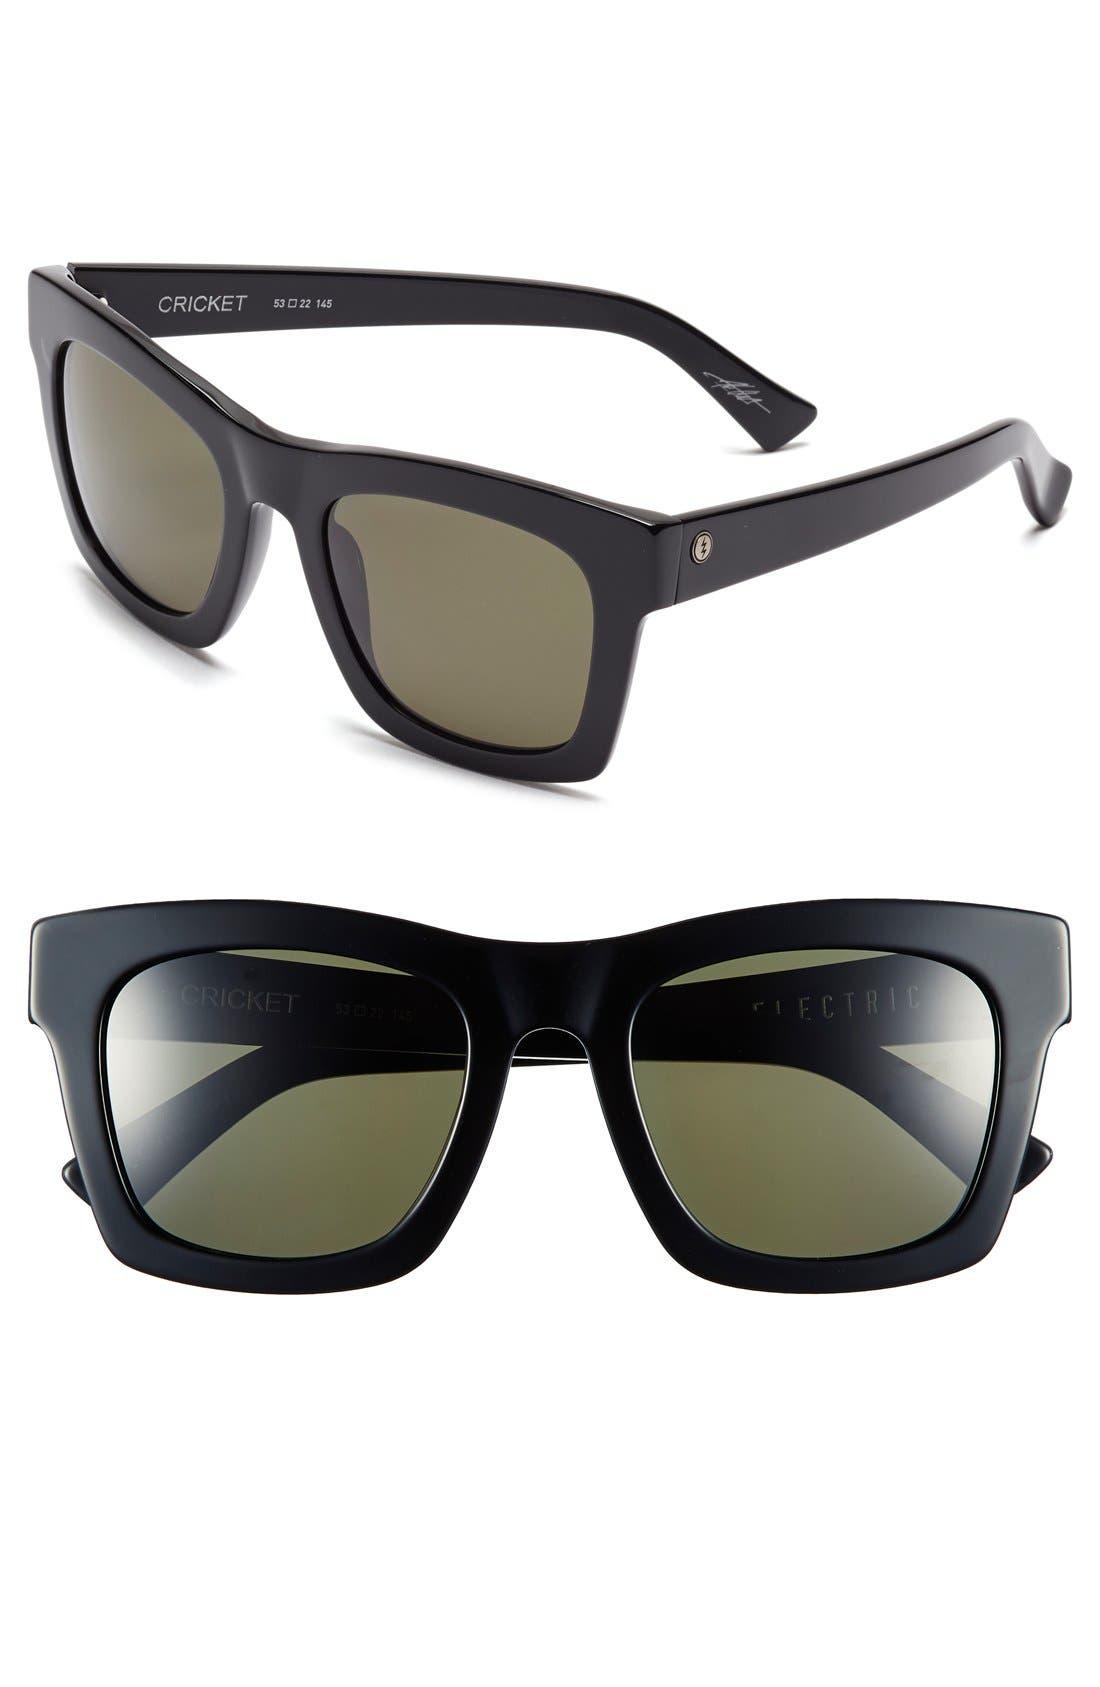 'Crasher' 54mm Retro Sunglasses,                             Main thumbnail 1, color,                             GLOSS BLACK/ GREY